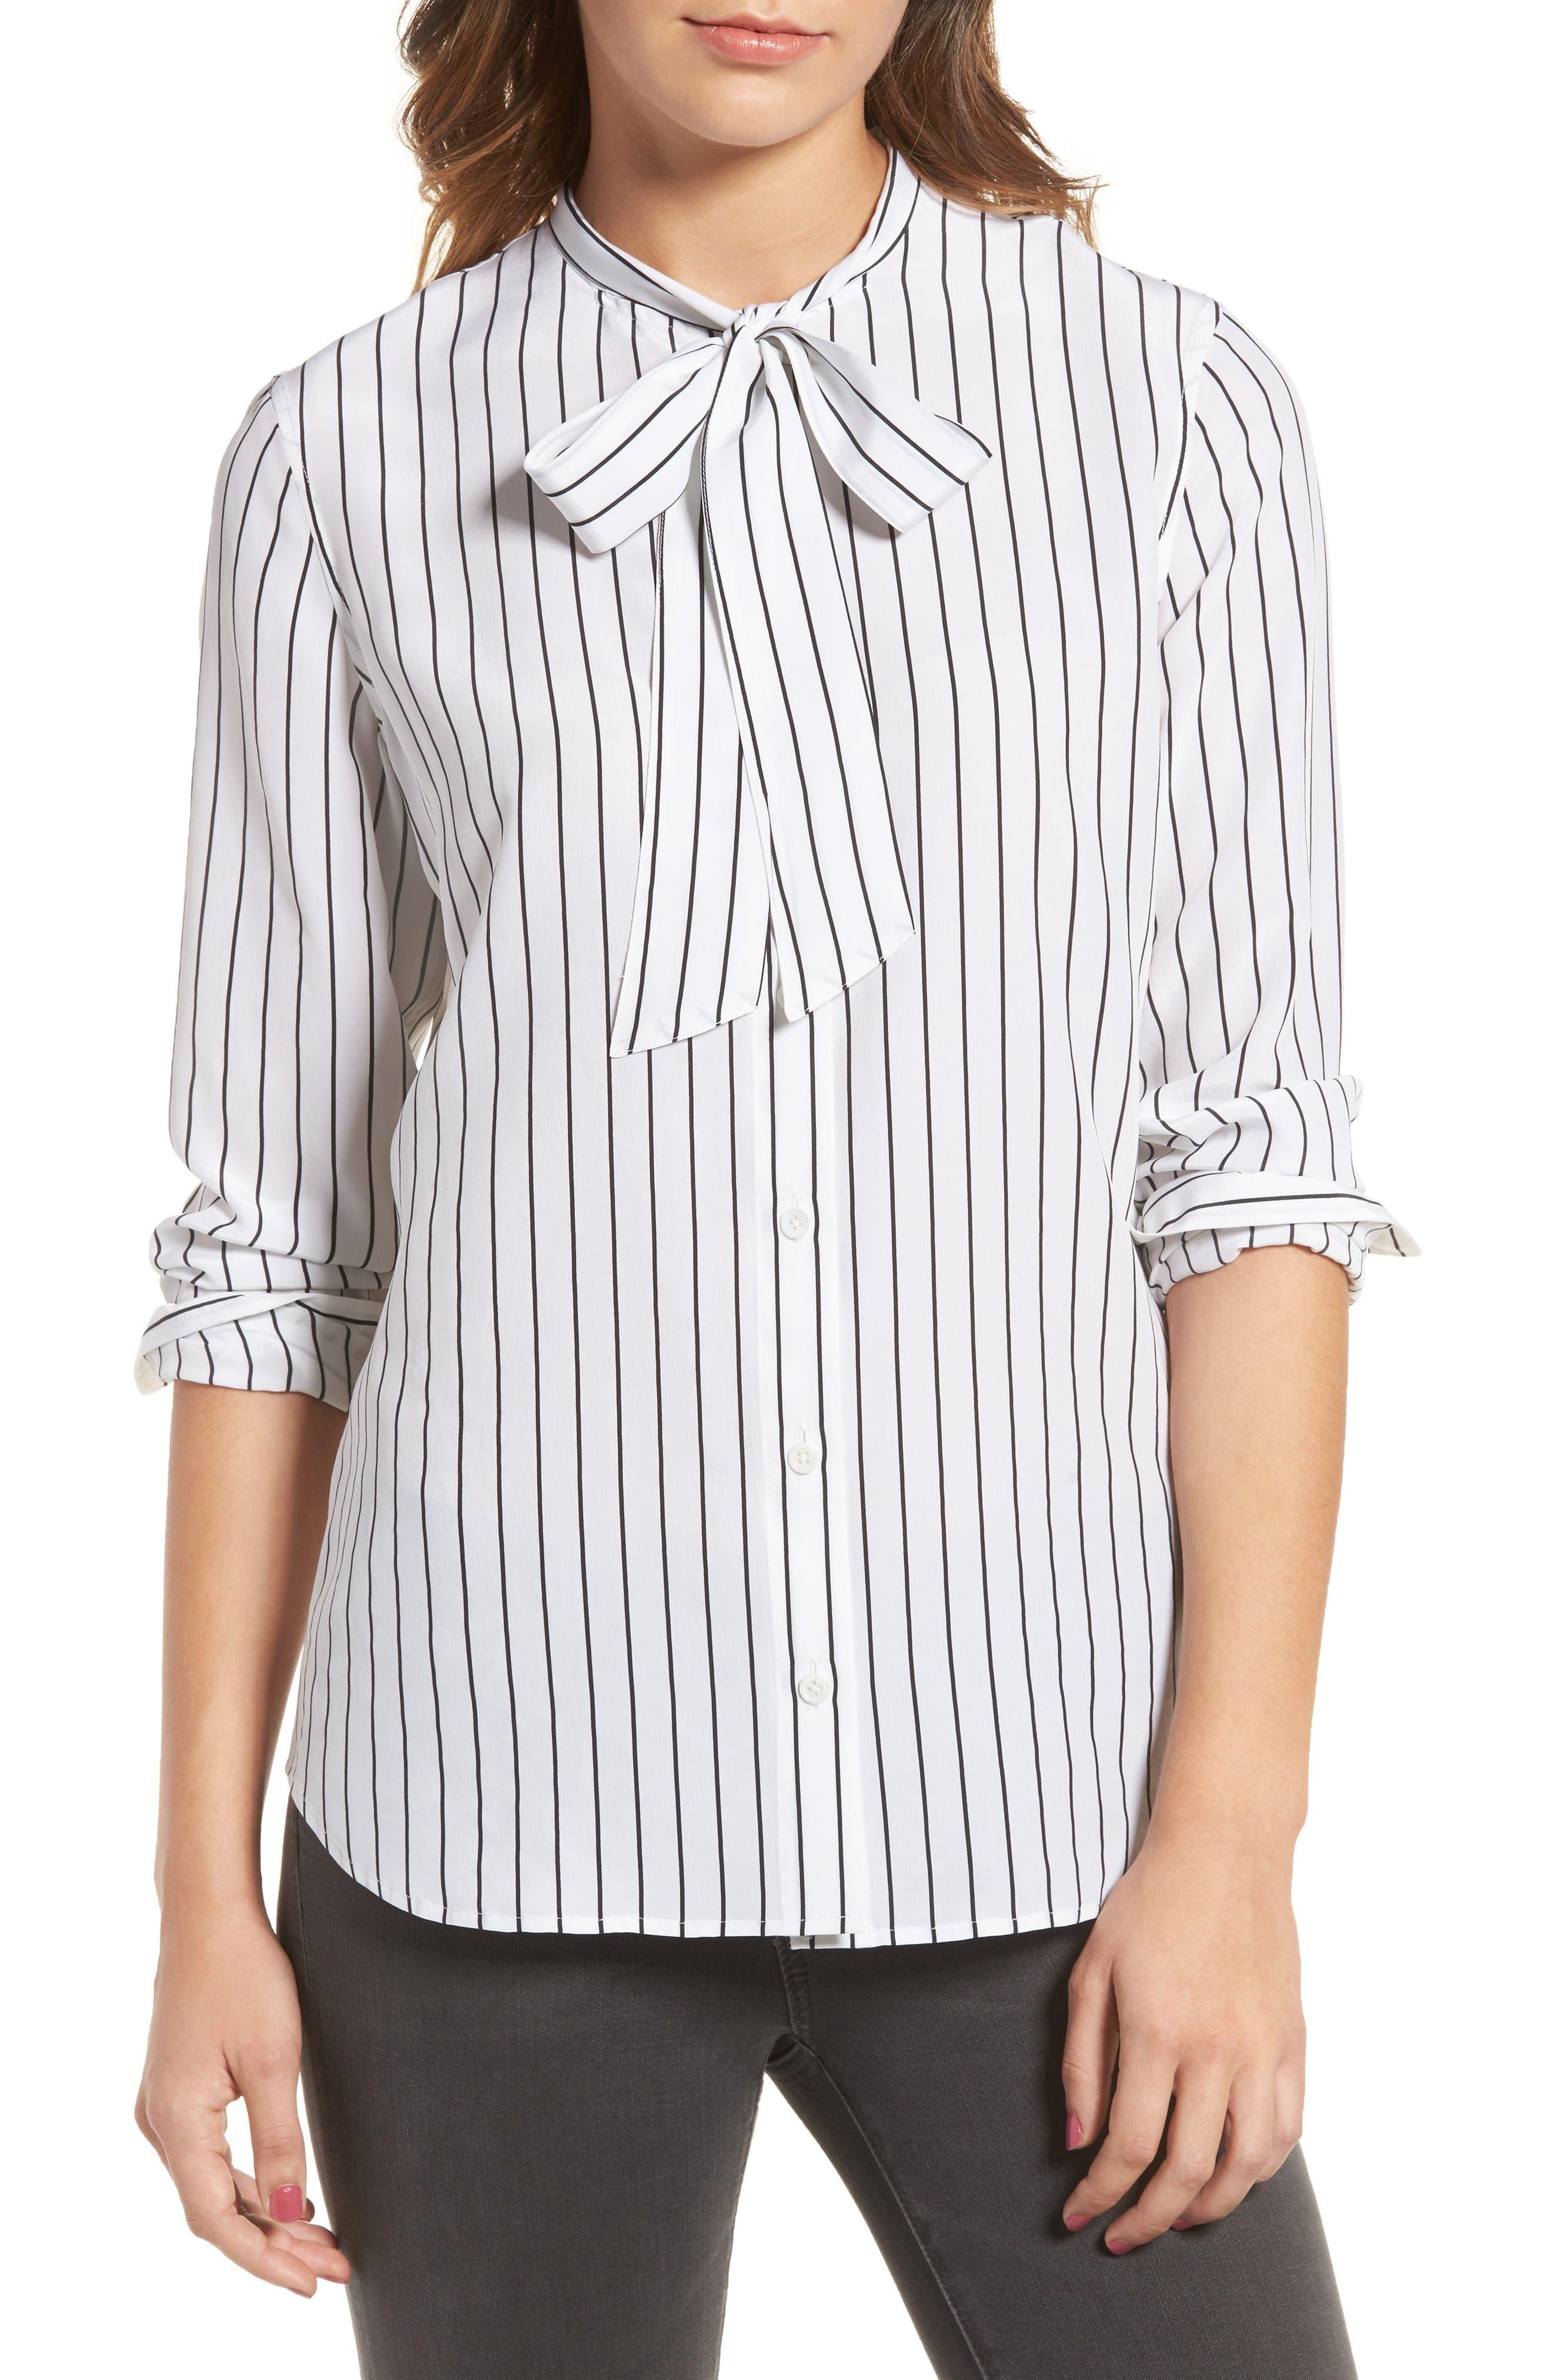 Claire Stripe Silk Shirt,                             Main thumbnail 1, color,                             True White / True Black Stripe